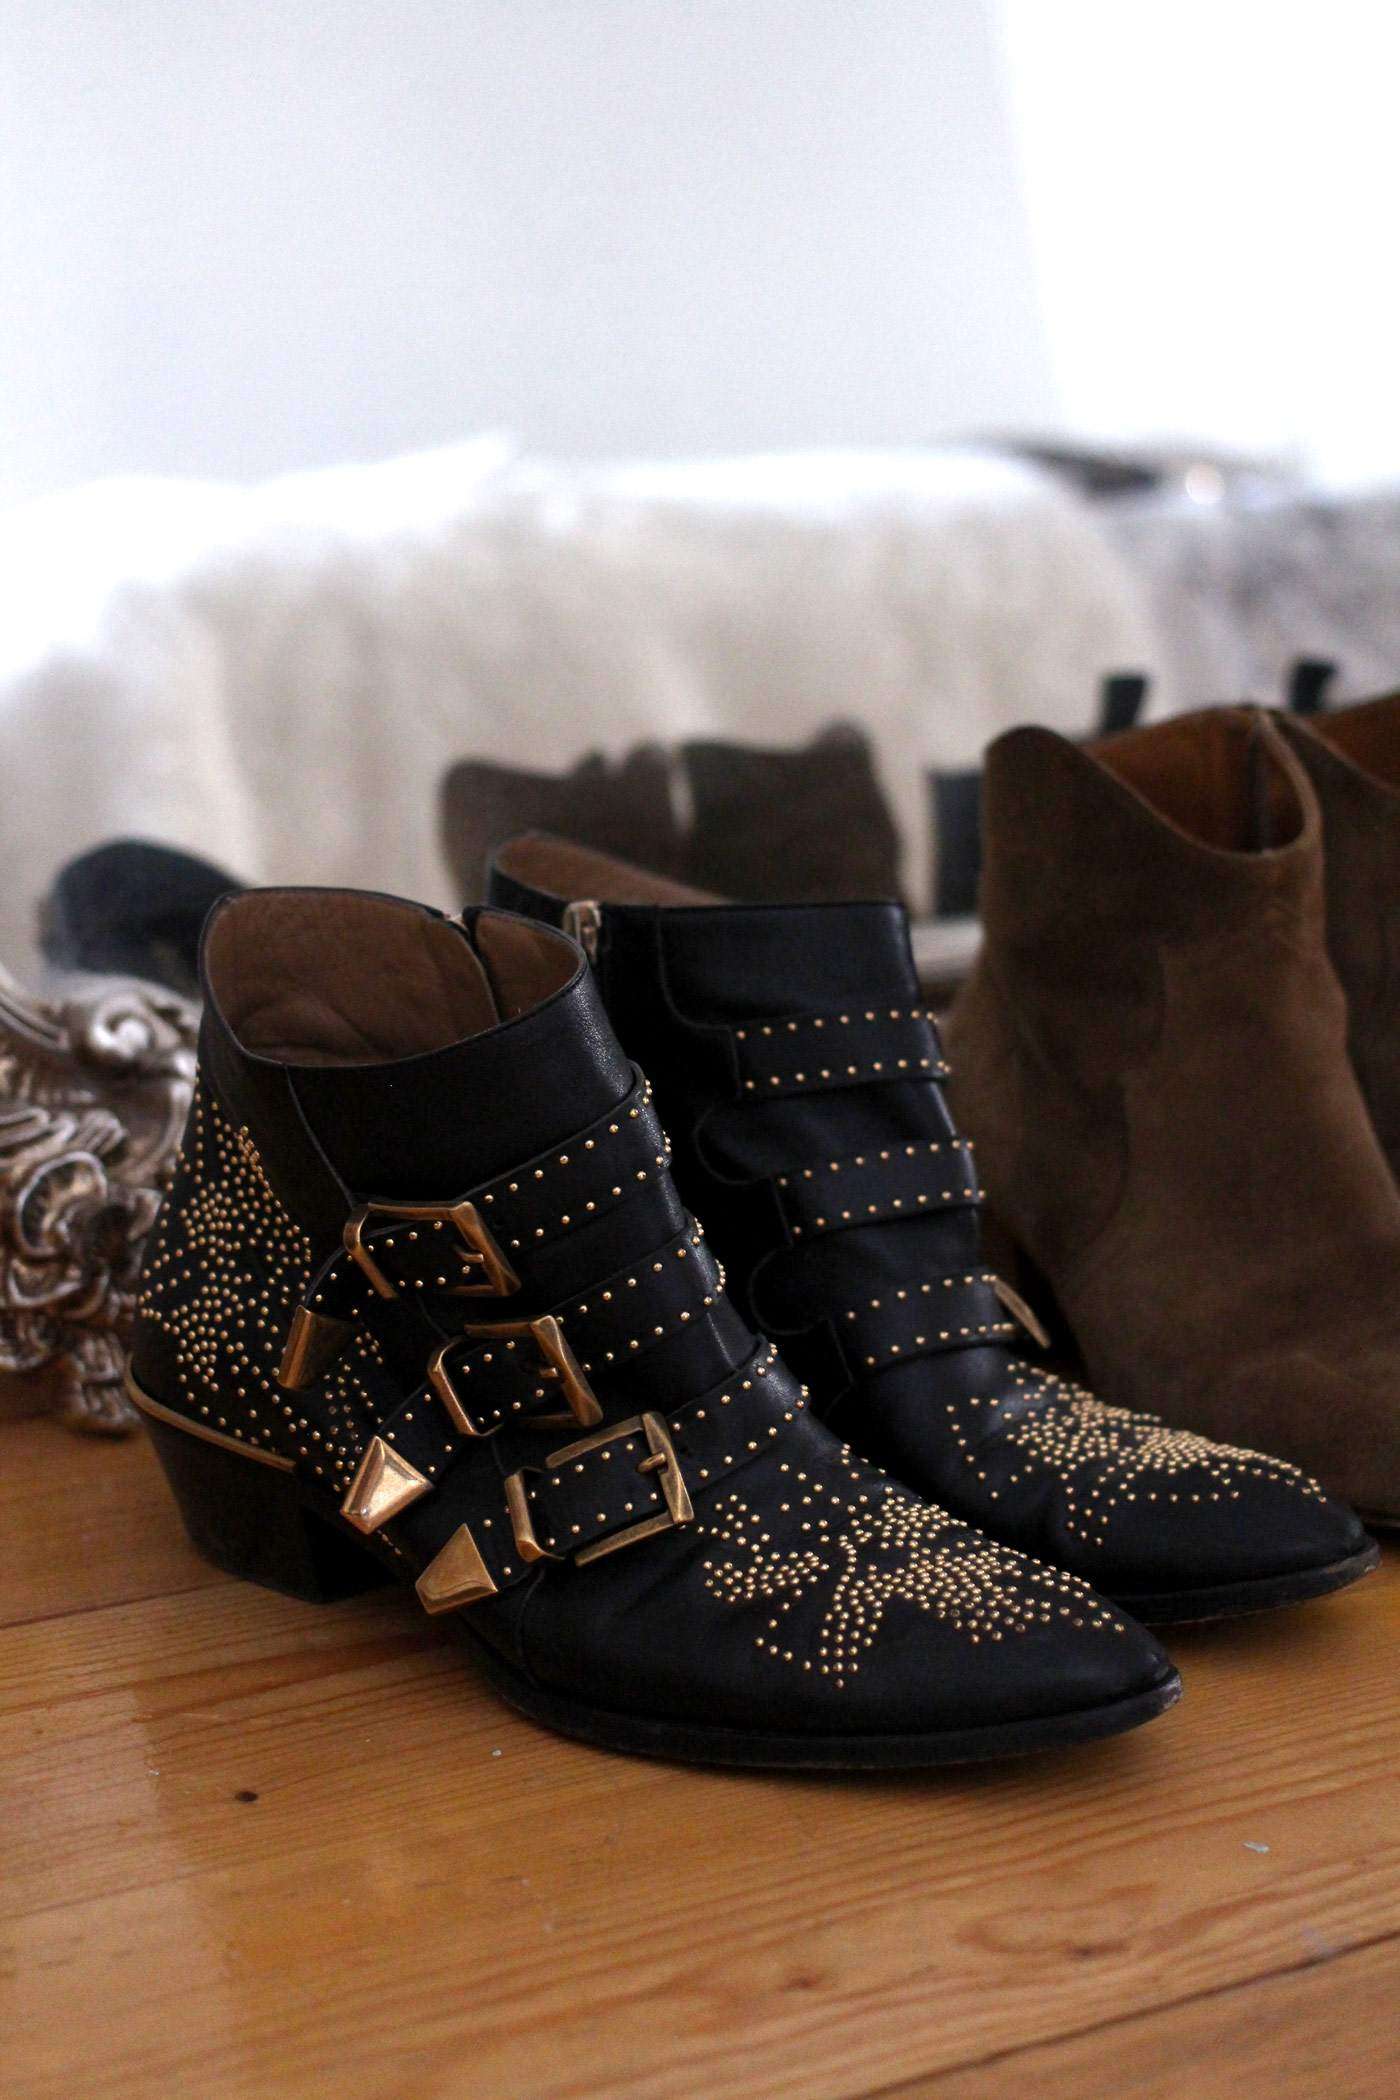 autumn-boots-chloe-susanna-studded-isabel-marant-dicker-acne-jensen-suede